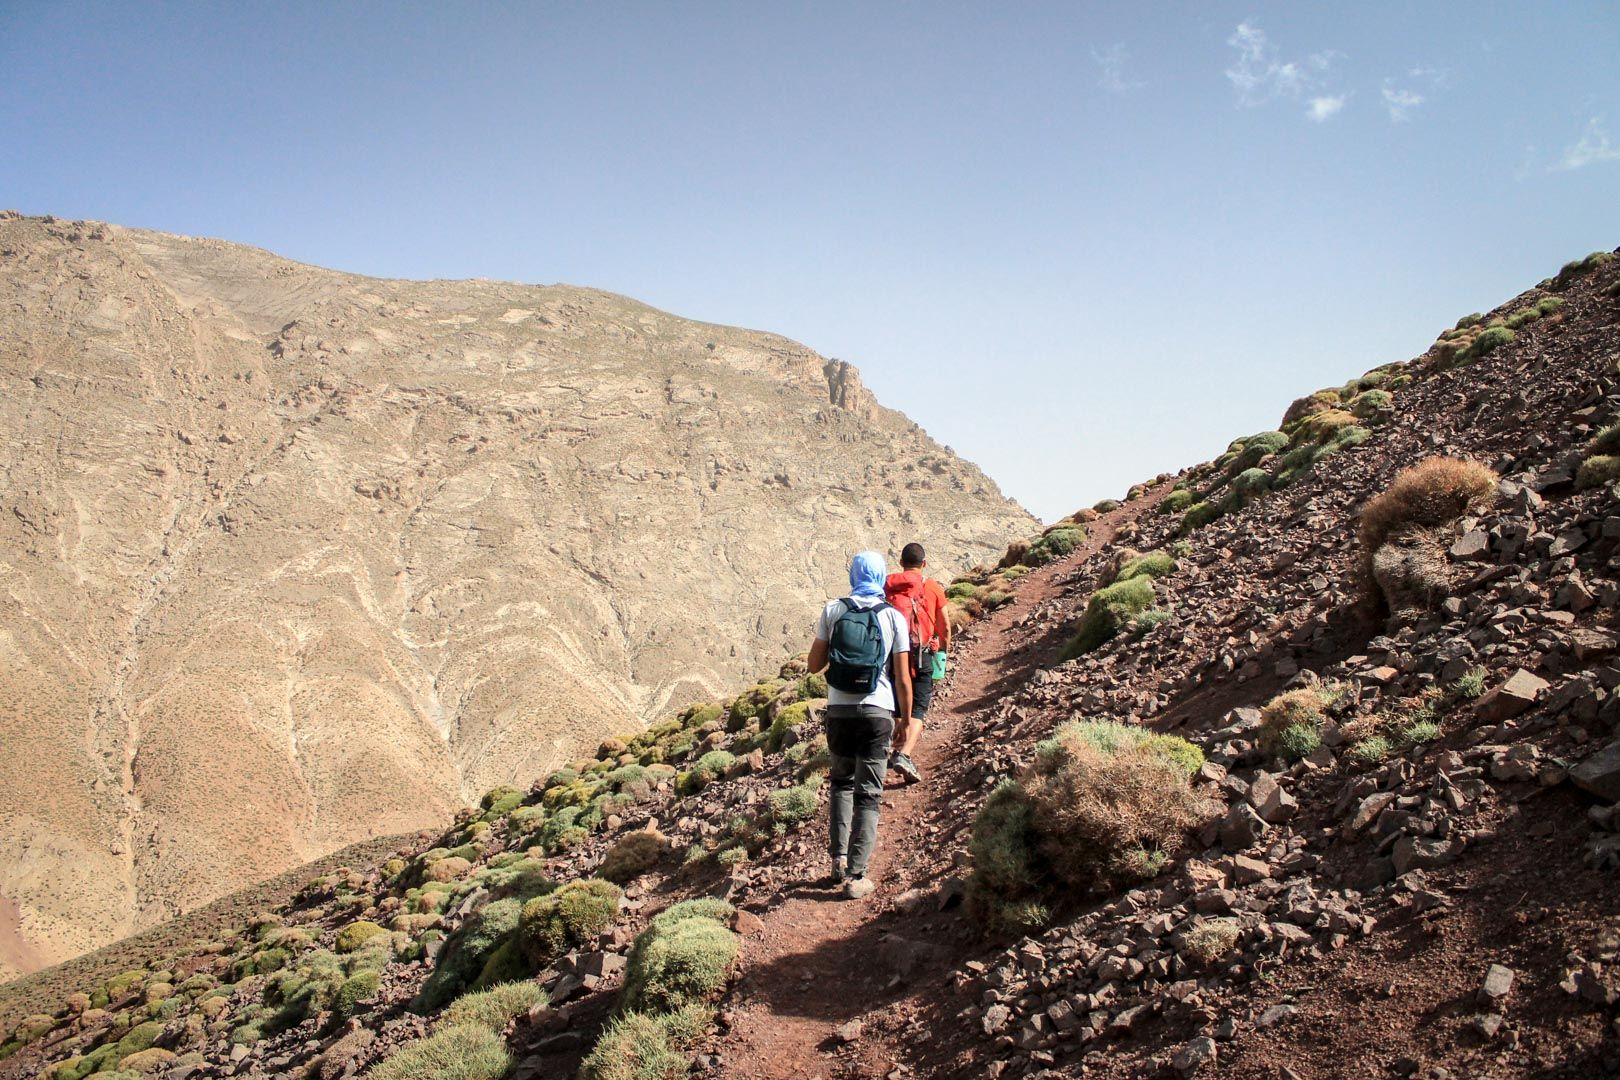 Rando au Maroc